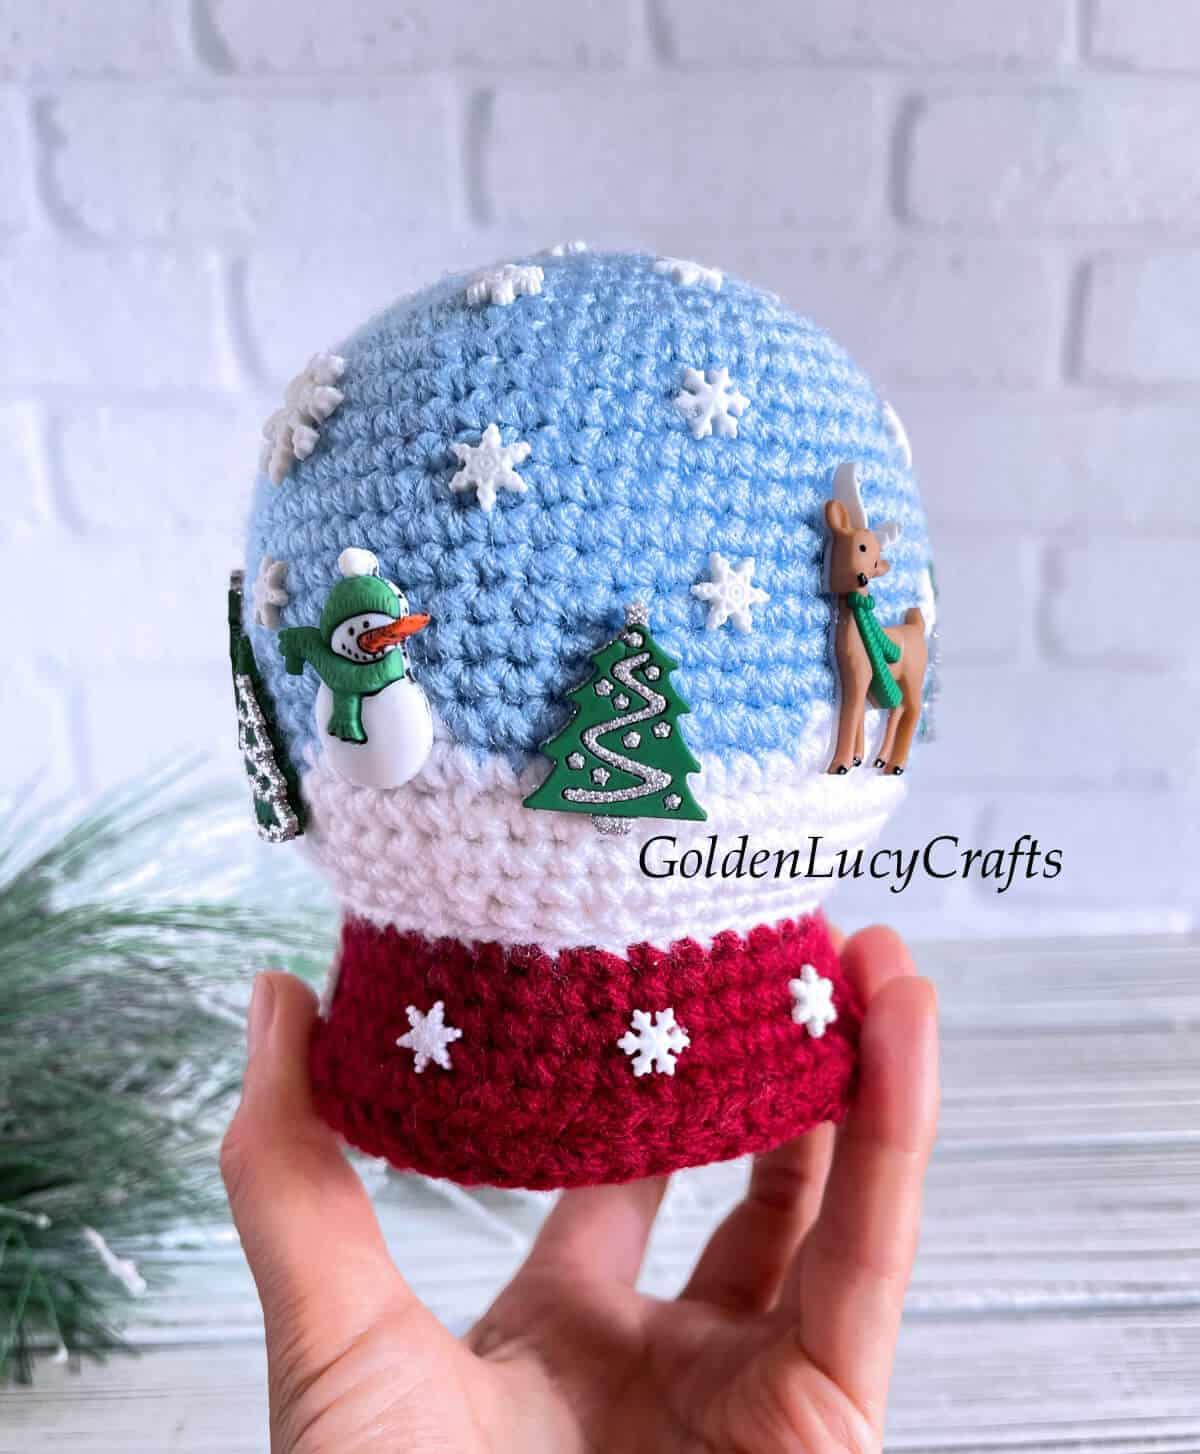 Crochet snowglobe amigurumi held by hand.